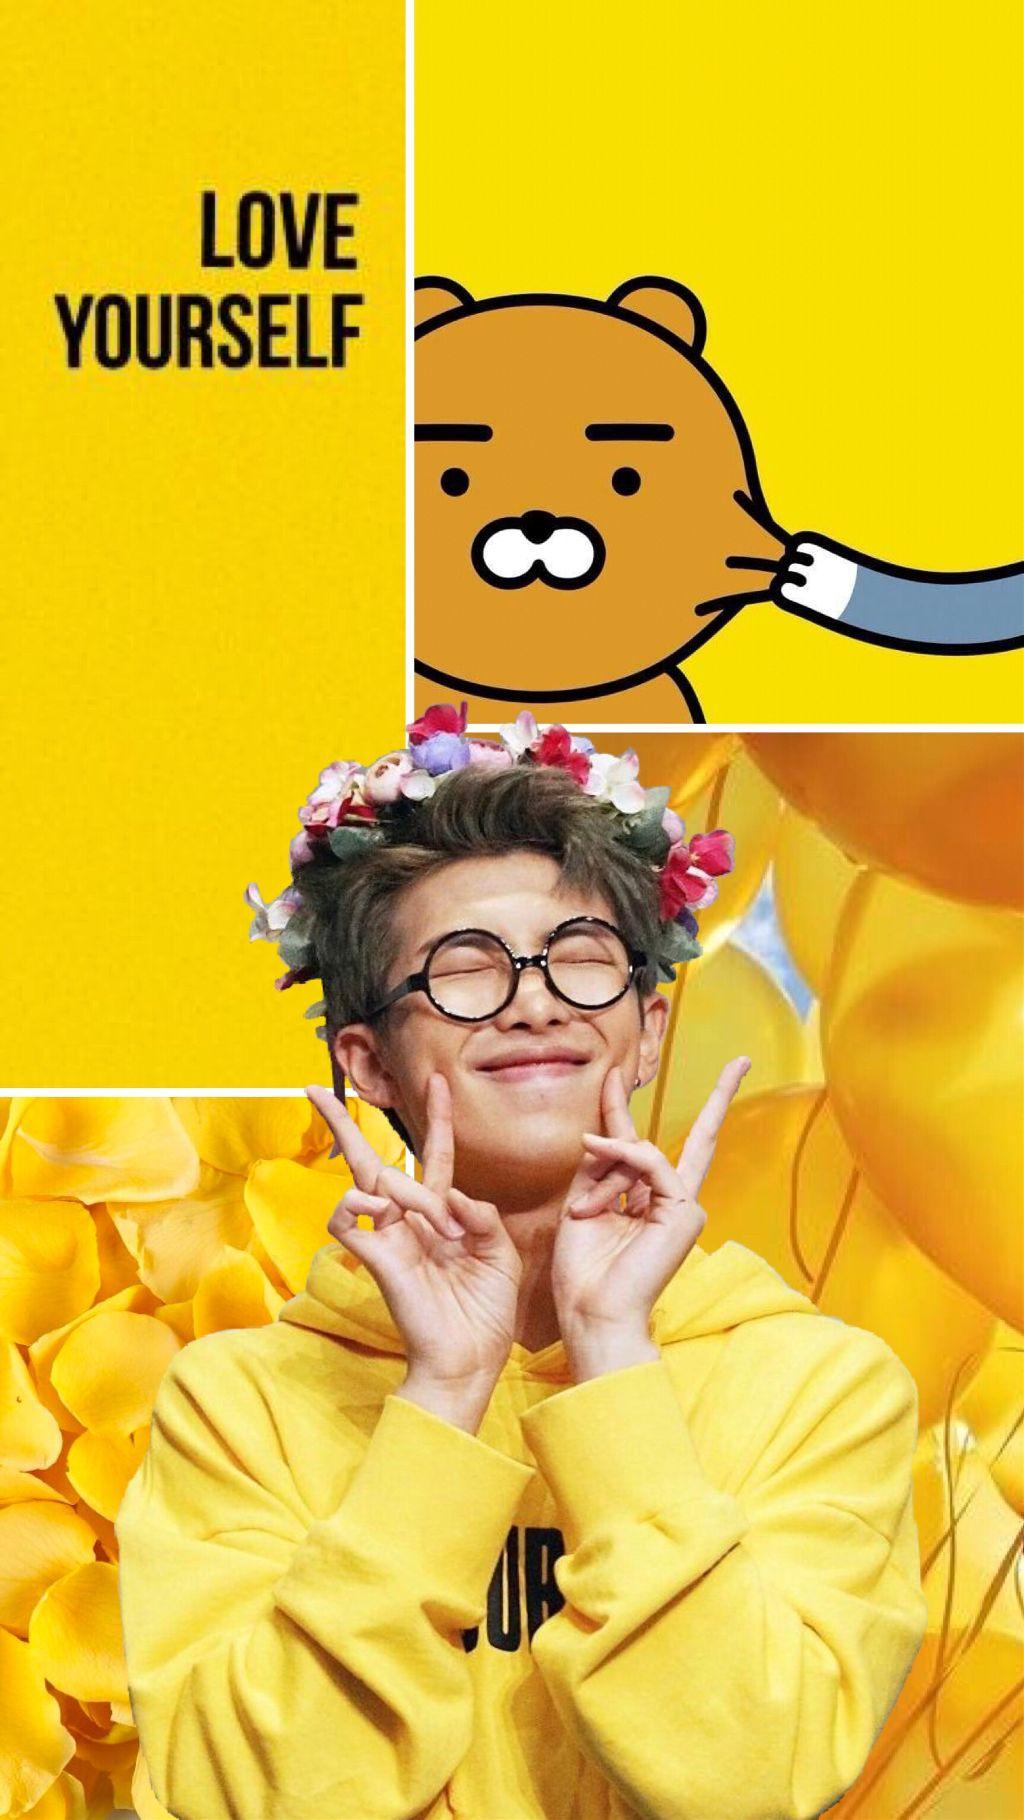 Freetoedit Bts Rm Yellow Aesthetic Kim Namjoon Ryan Wal